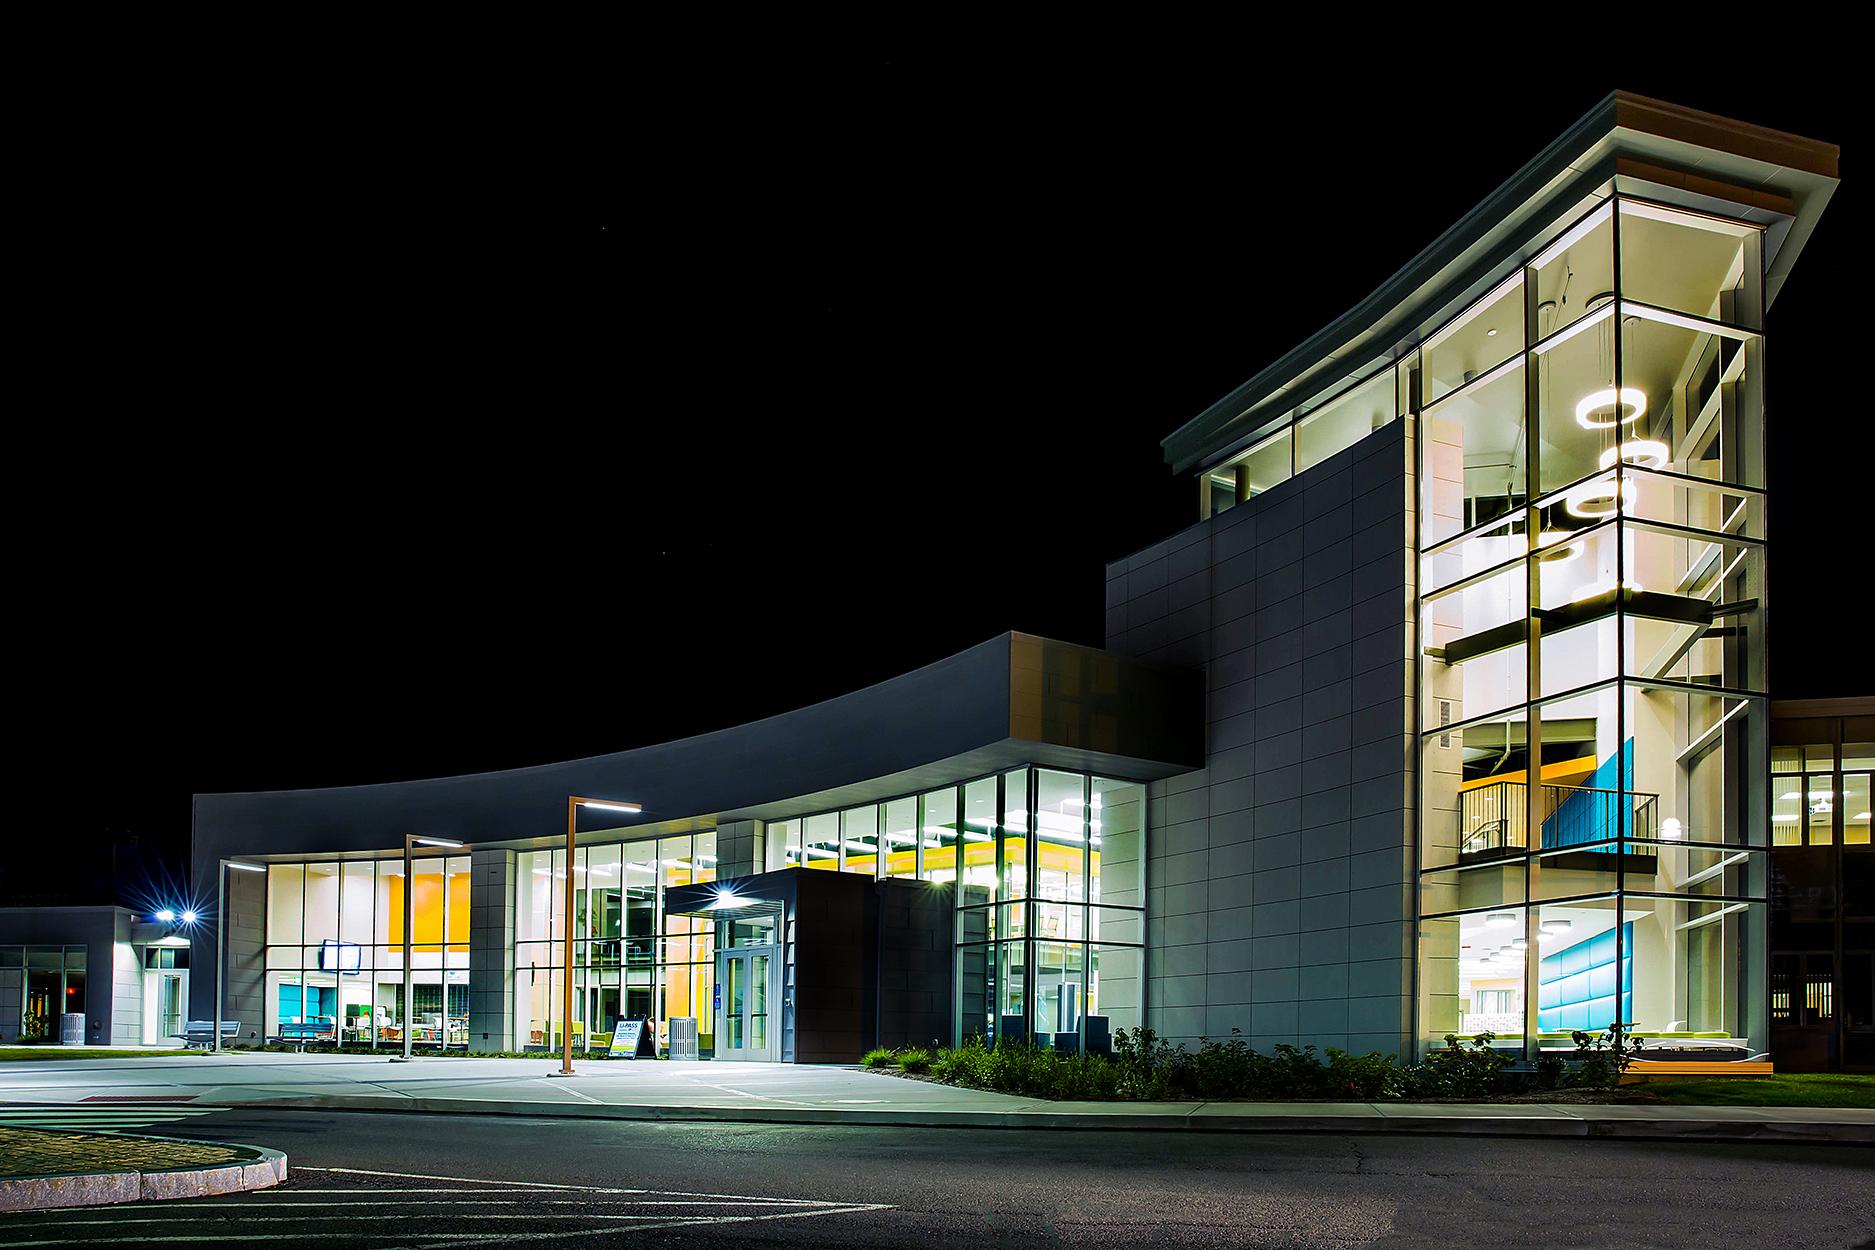 acc-building-night-photo